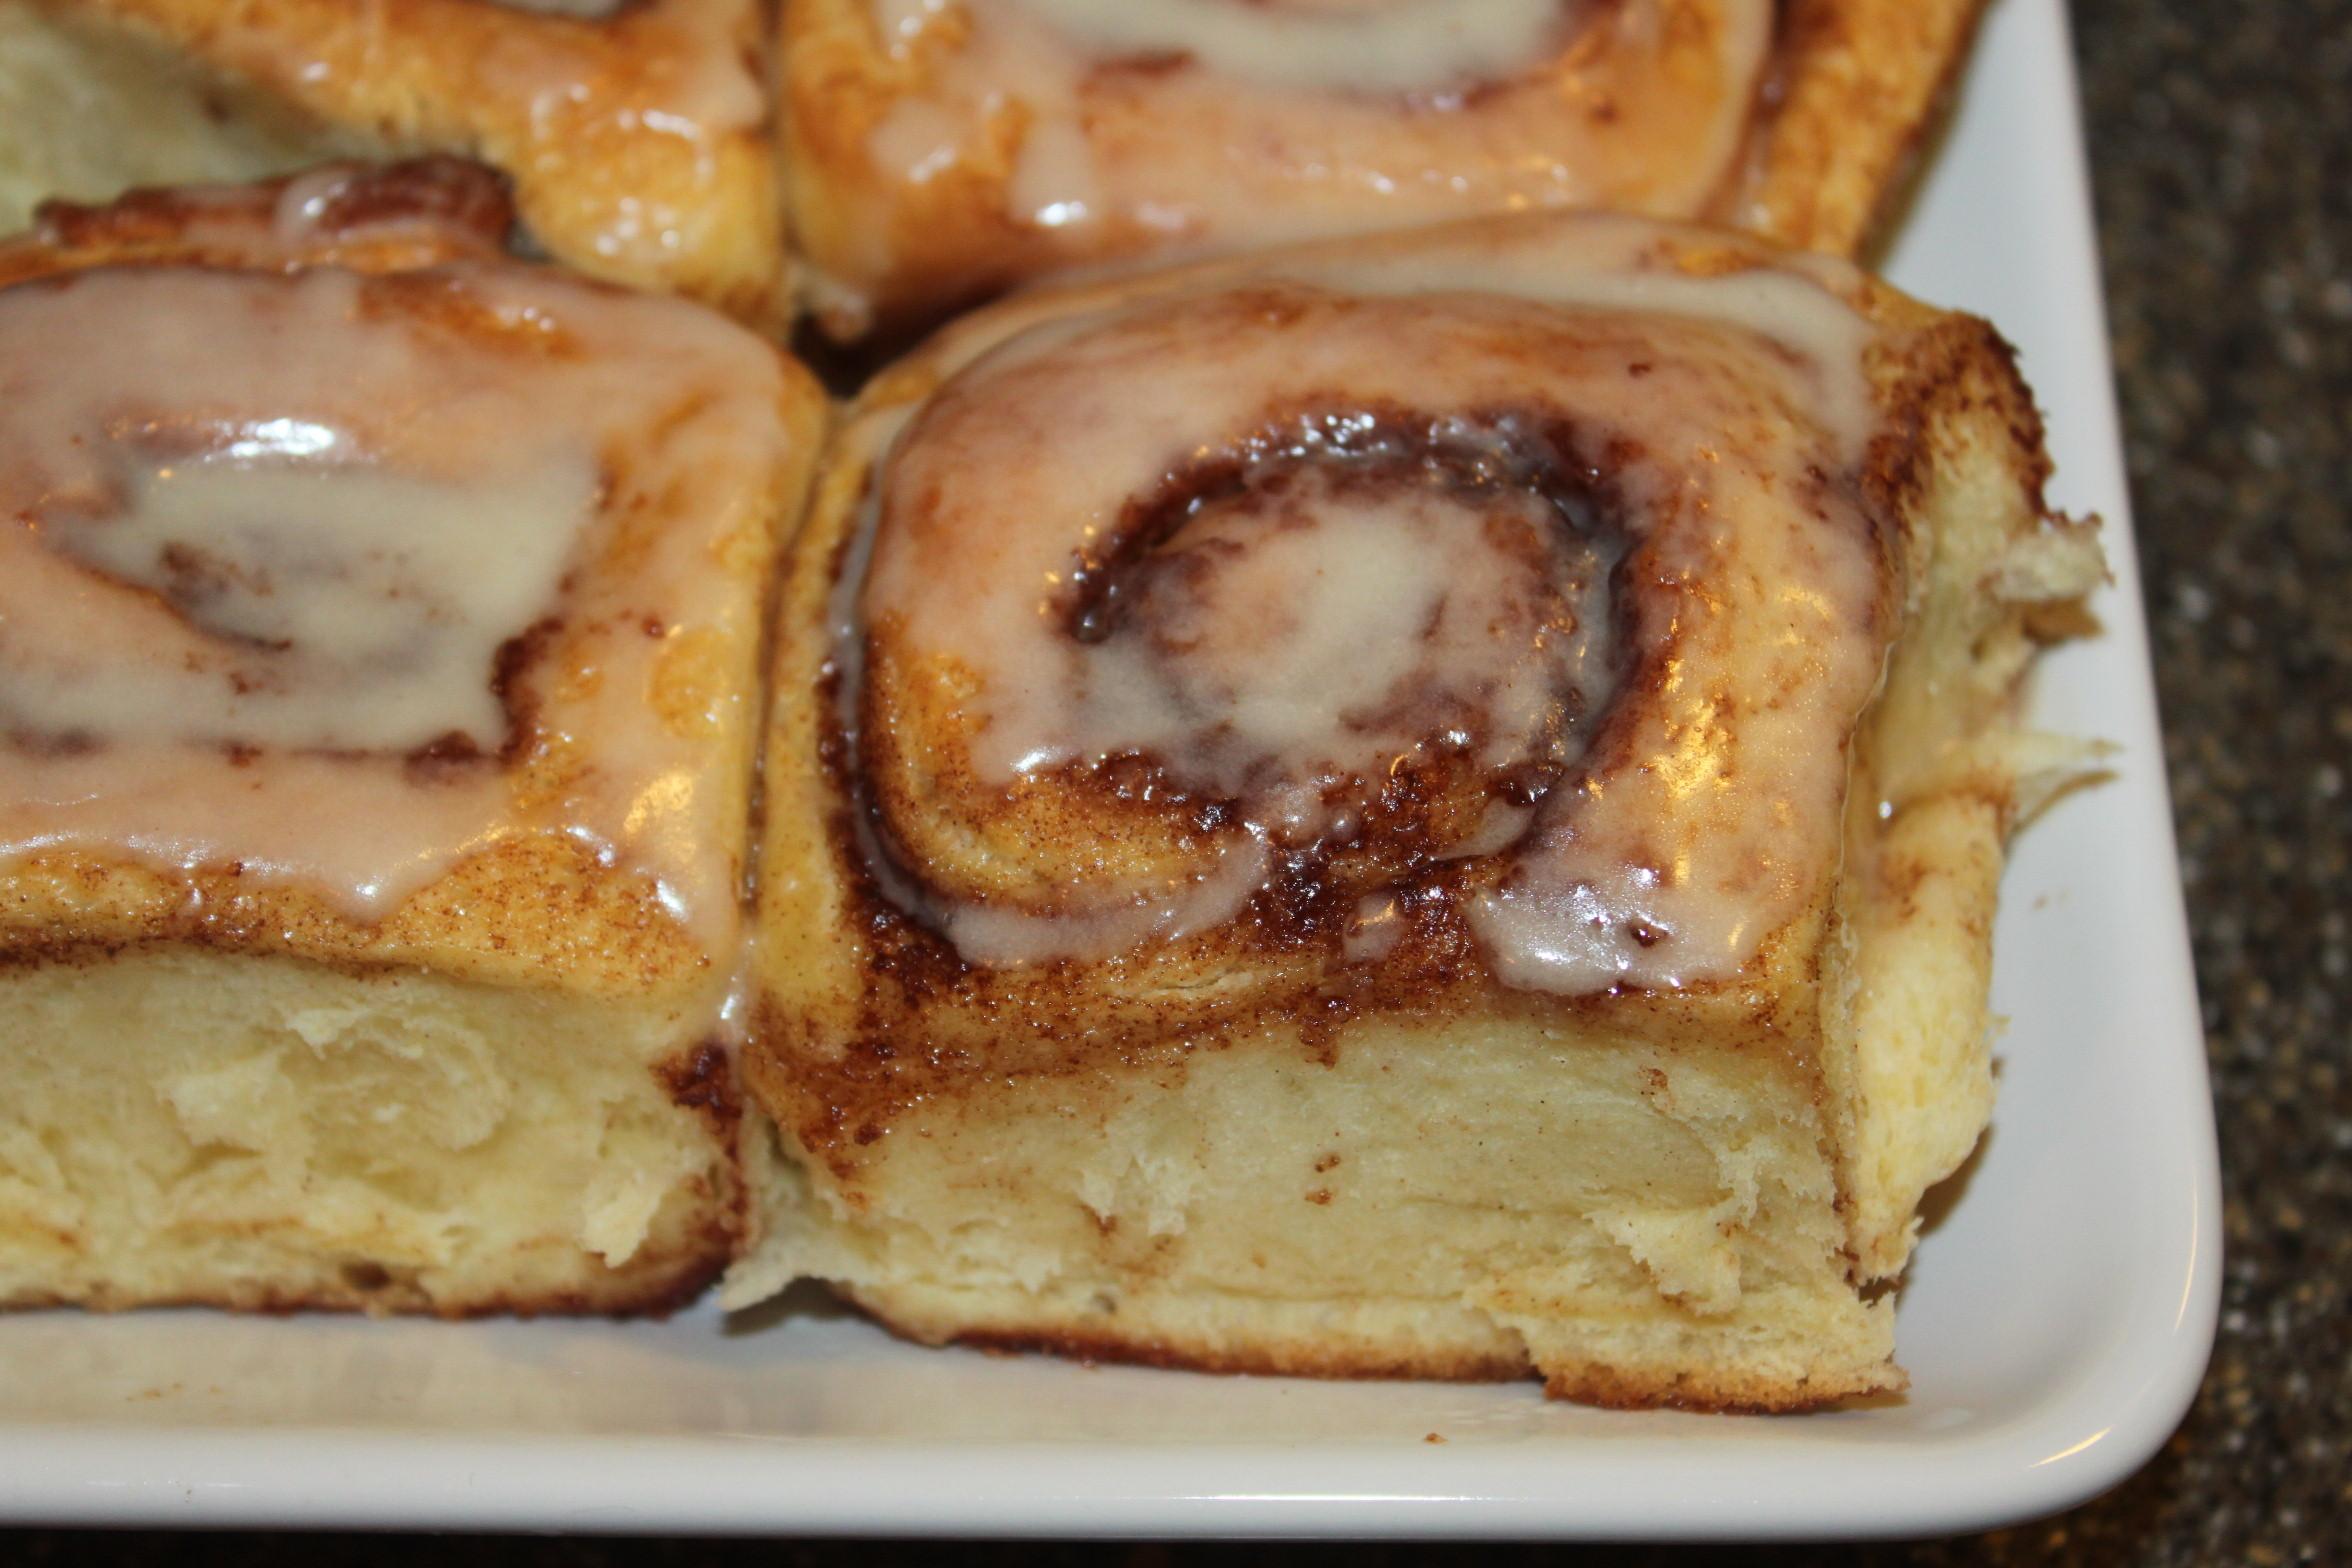 Overnight Cinnamon Roll Recipe – An Easy-Make Christmas Morning Treat